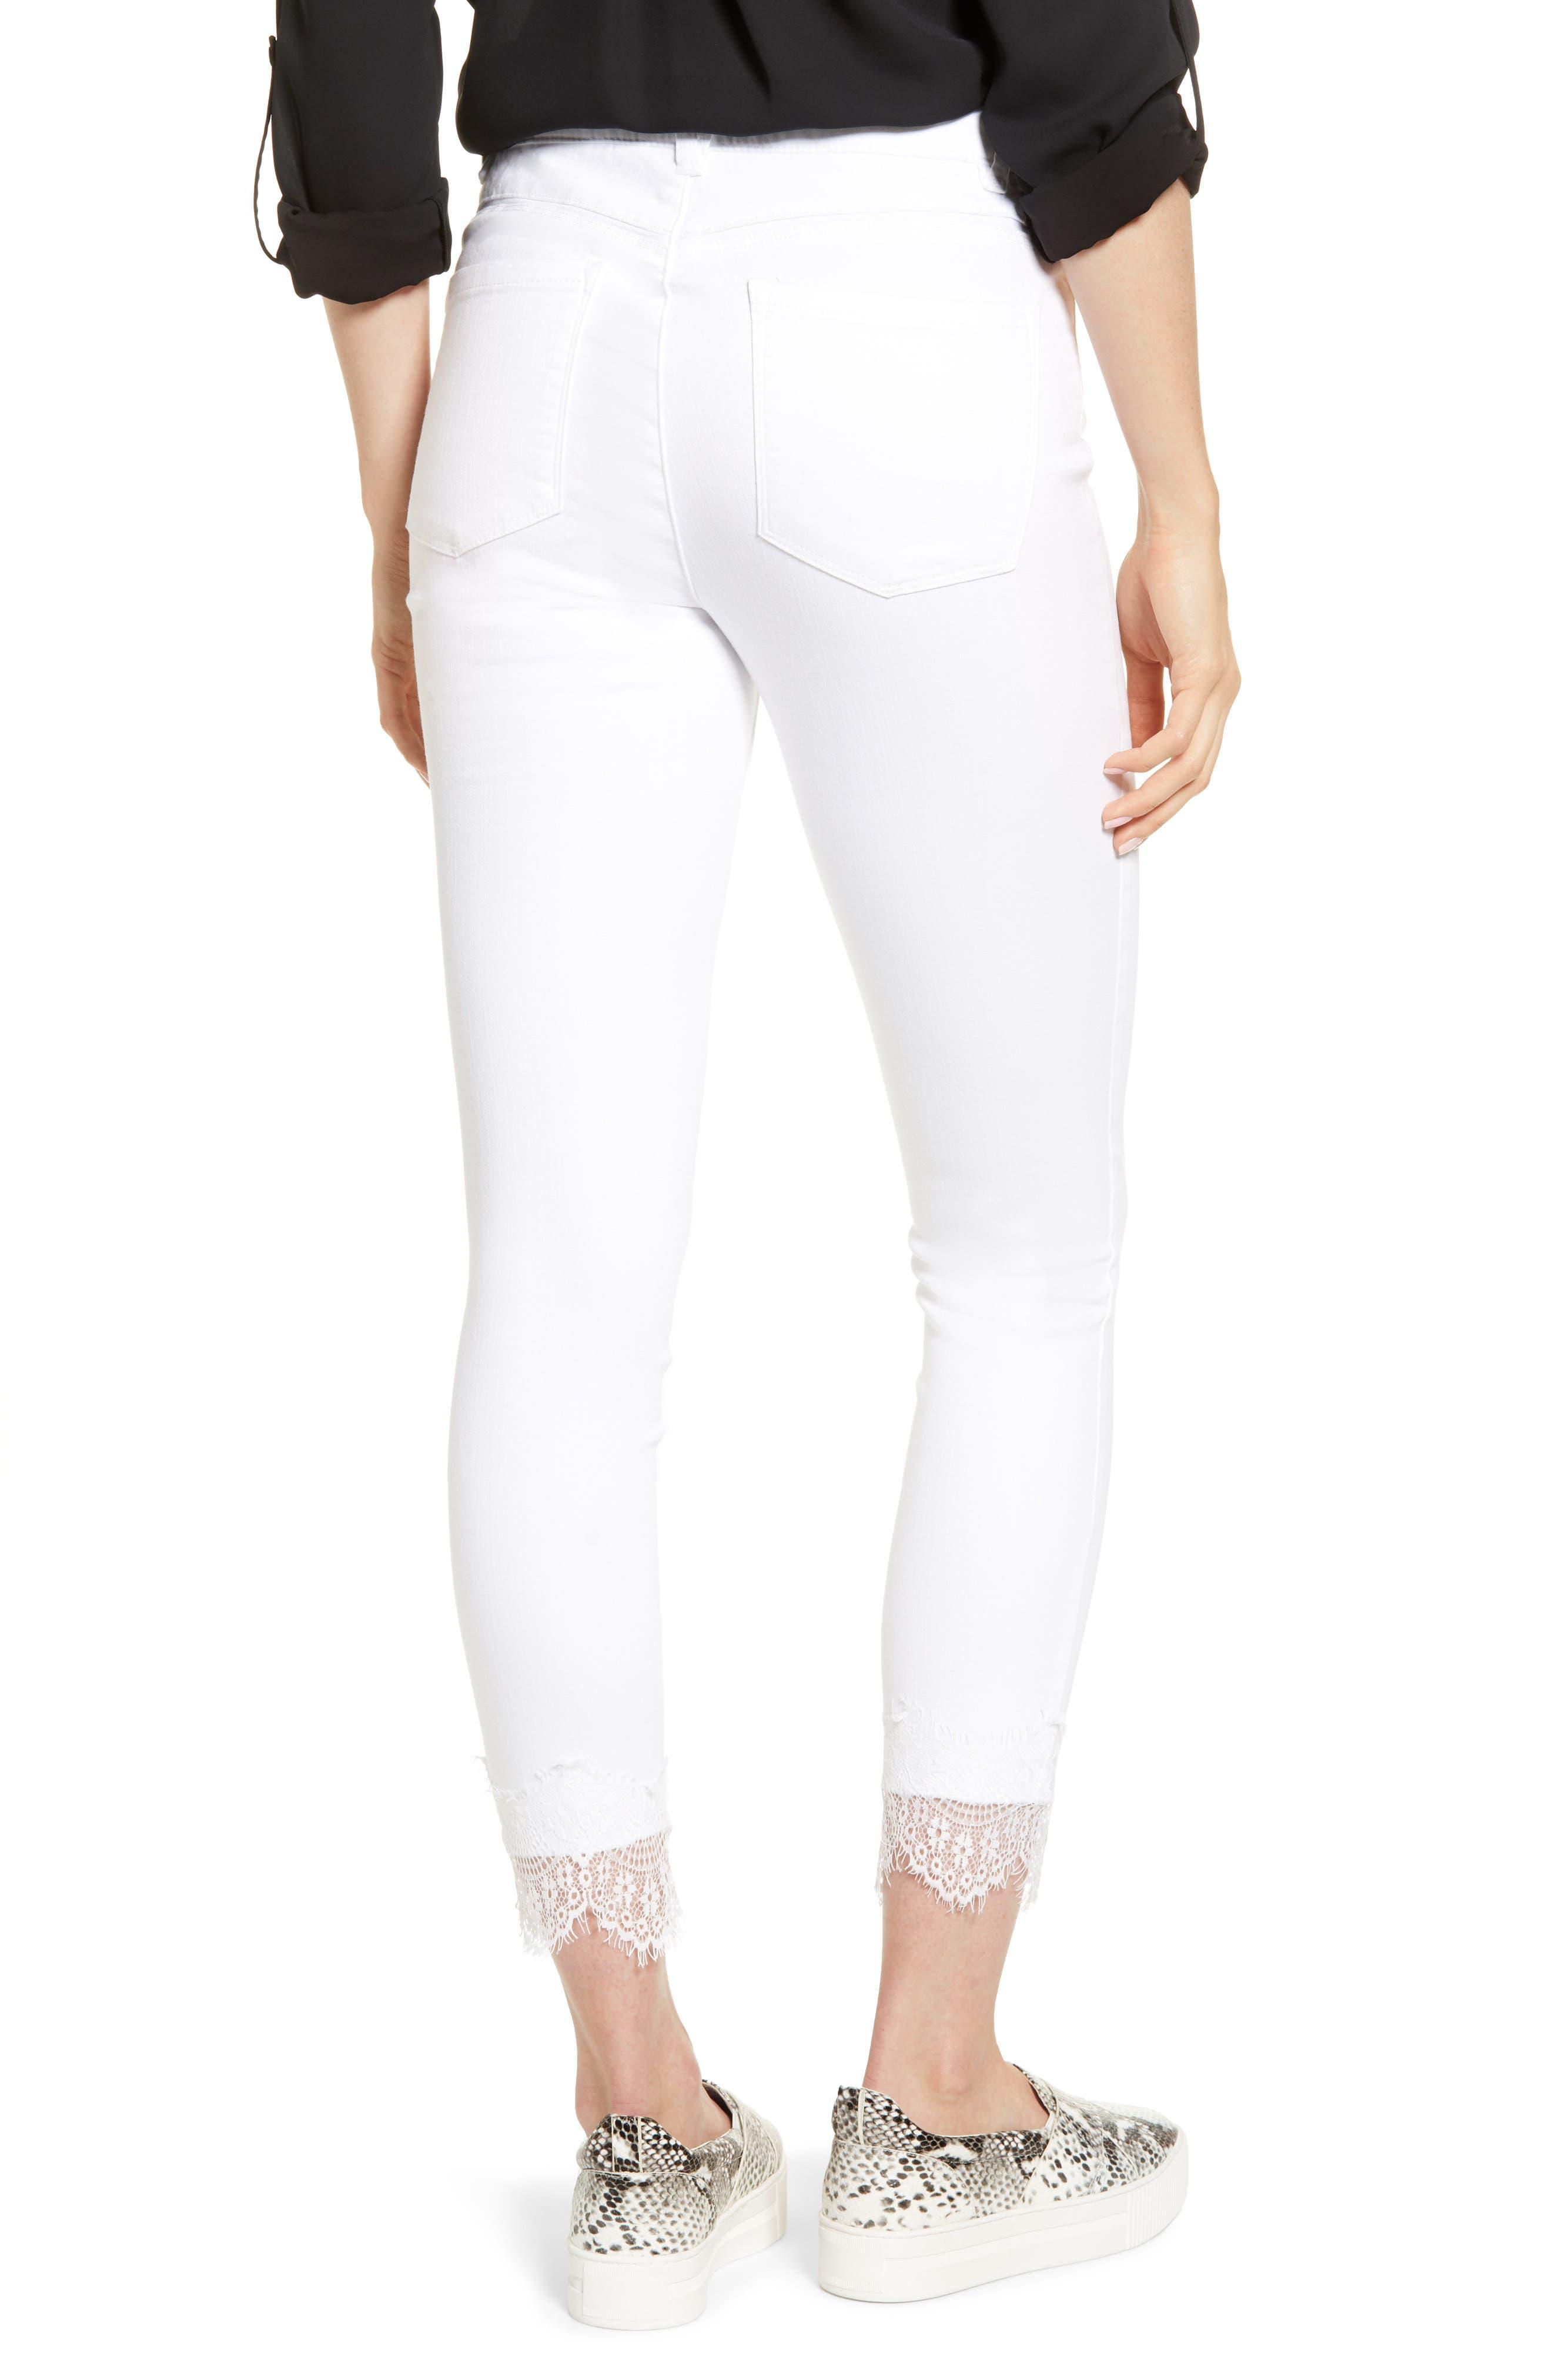 WIT & WISDOM, Ab-Solution Lace Hem High Waist Jeans, Alternate thumbnail 2, color, OPTIC WHITE